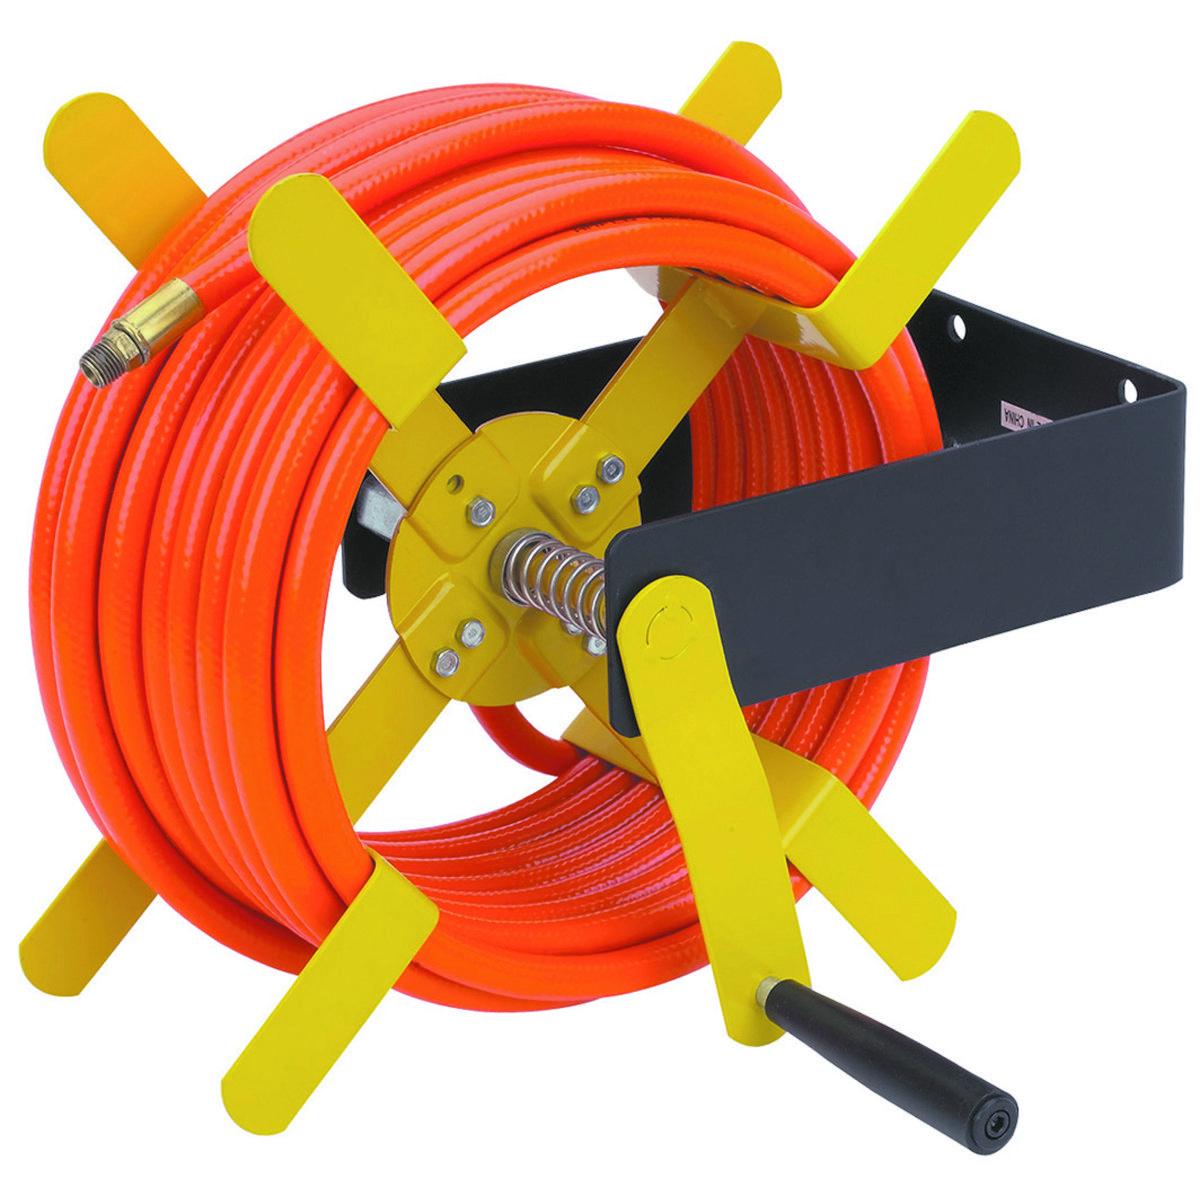 Mount this durable steel air hose reel vertically or